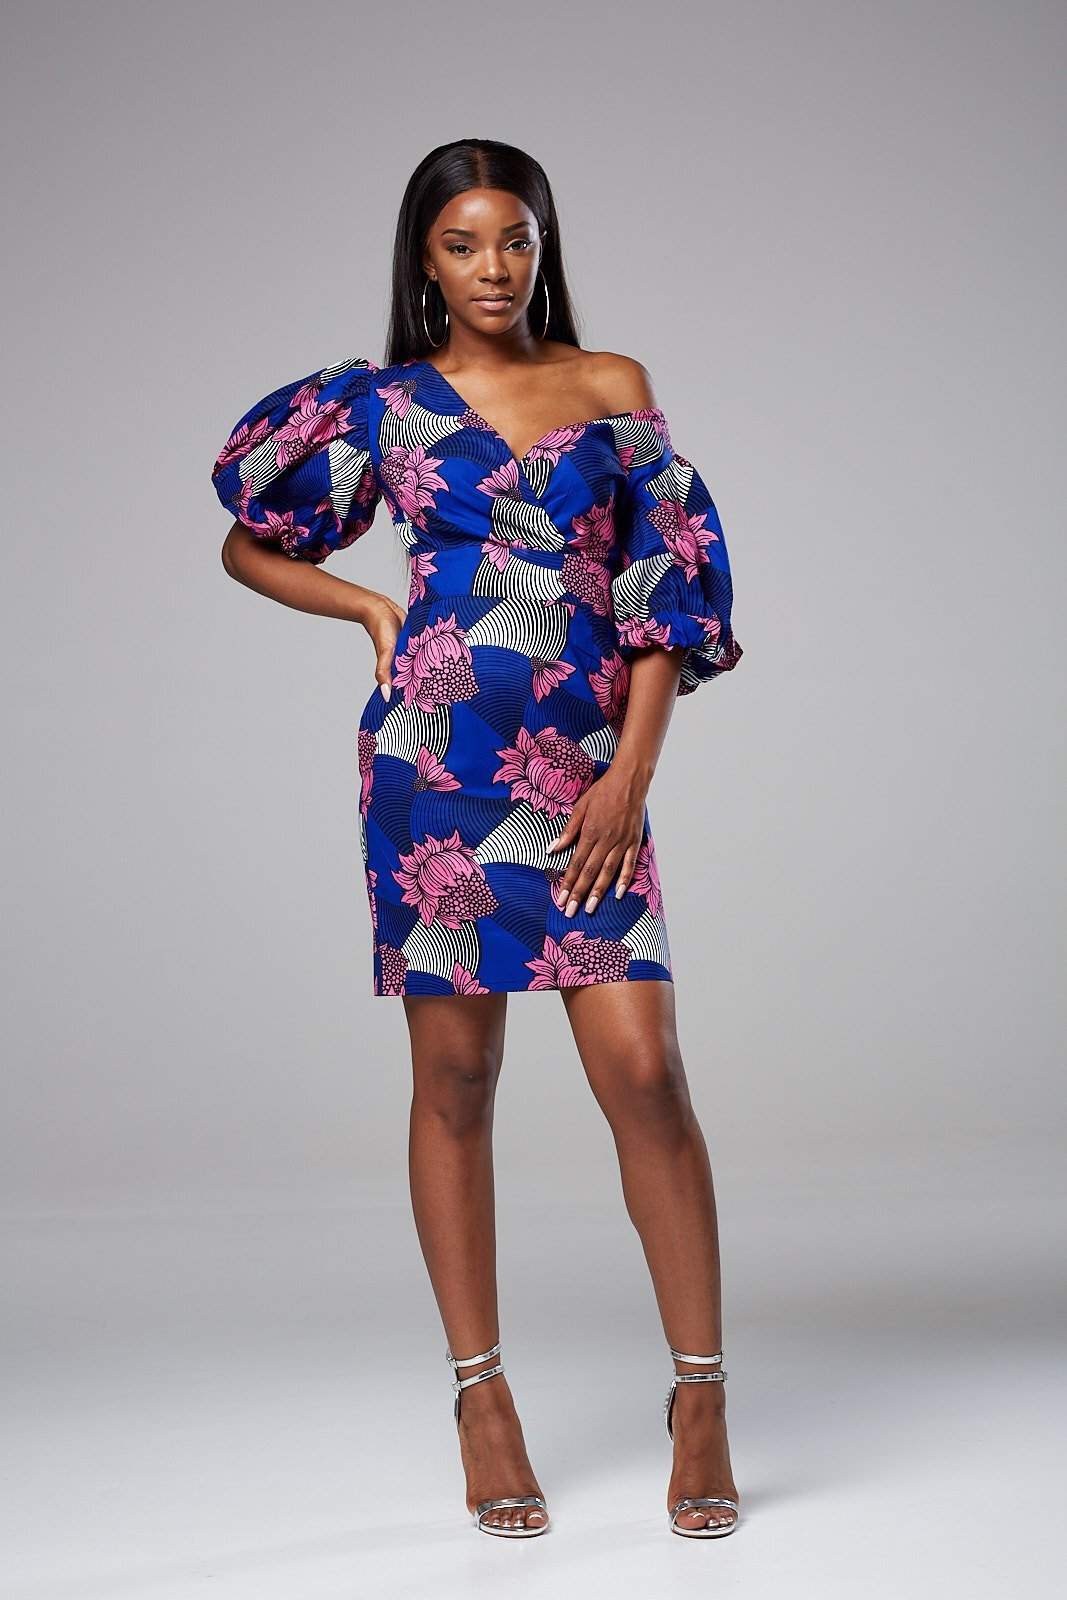 African Print Dresses 2019 Latest Ankara Styles